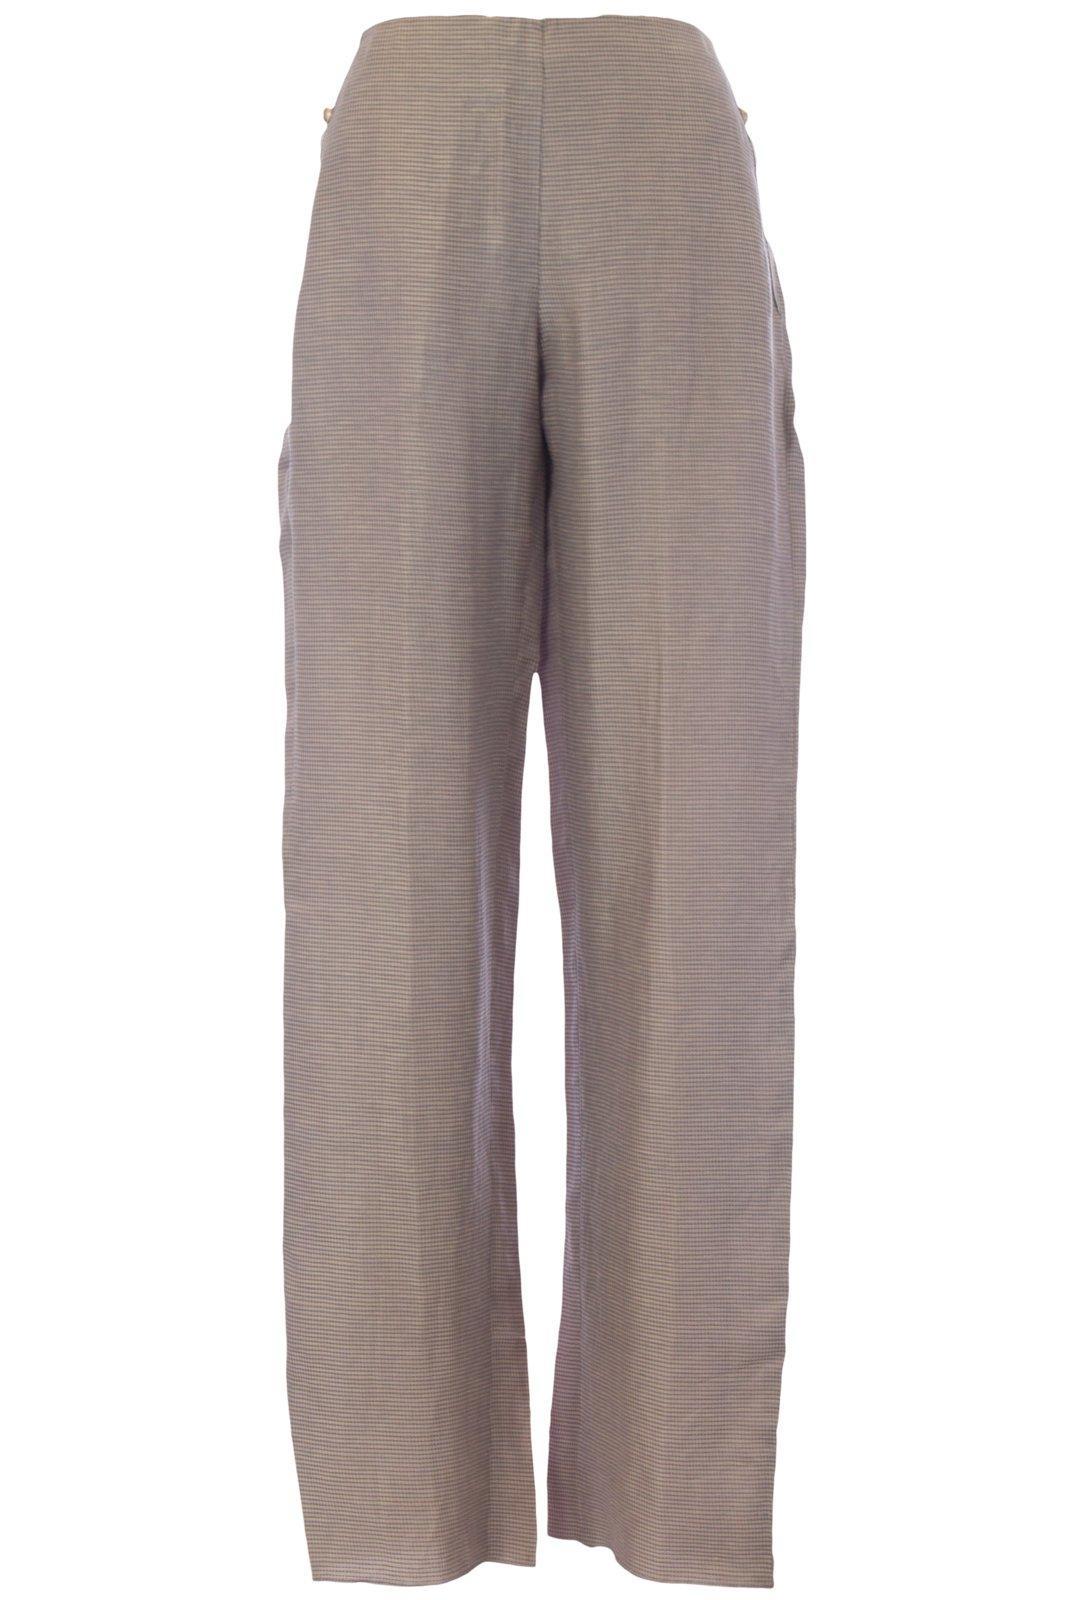 Giorgio Armani Women's Side Pocket Textured Dress Pants IT 44 Taupe